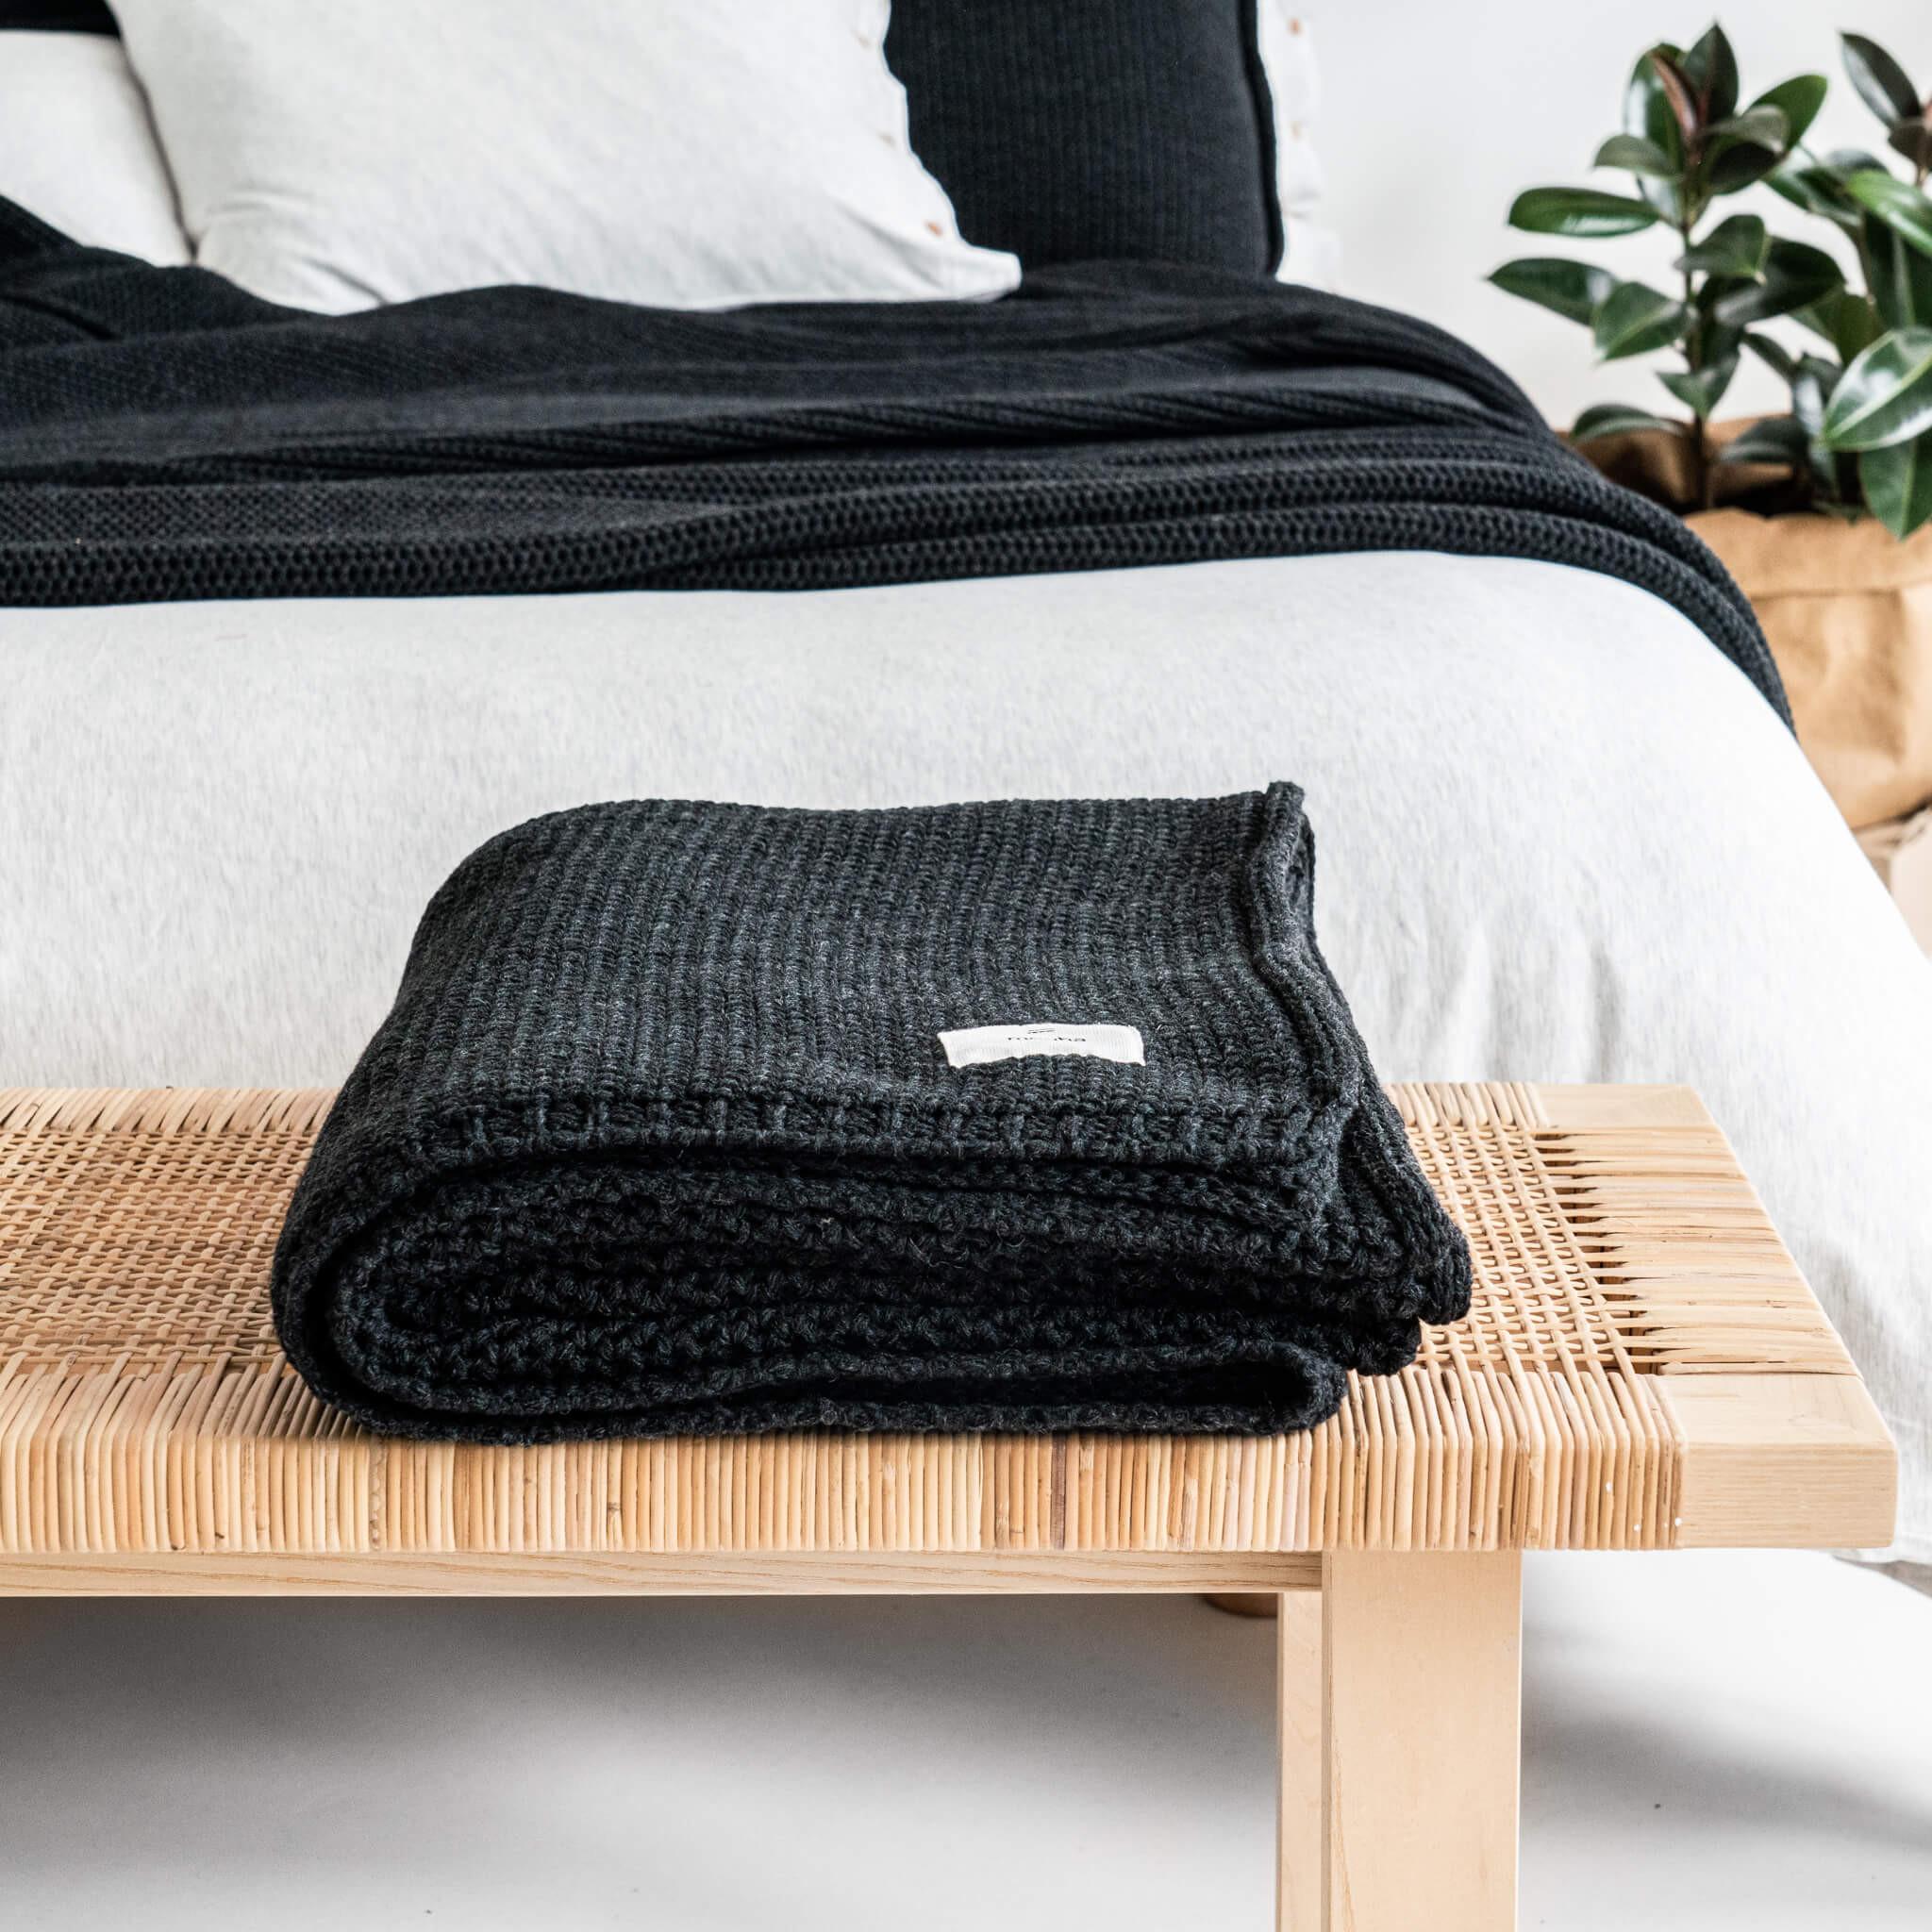 5048-moyha-take-a-rest-blanket-anthracite-2